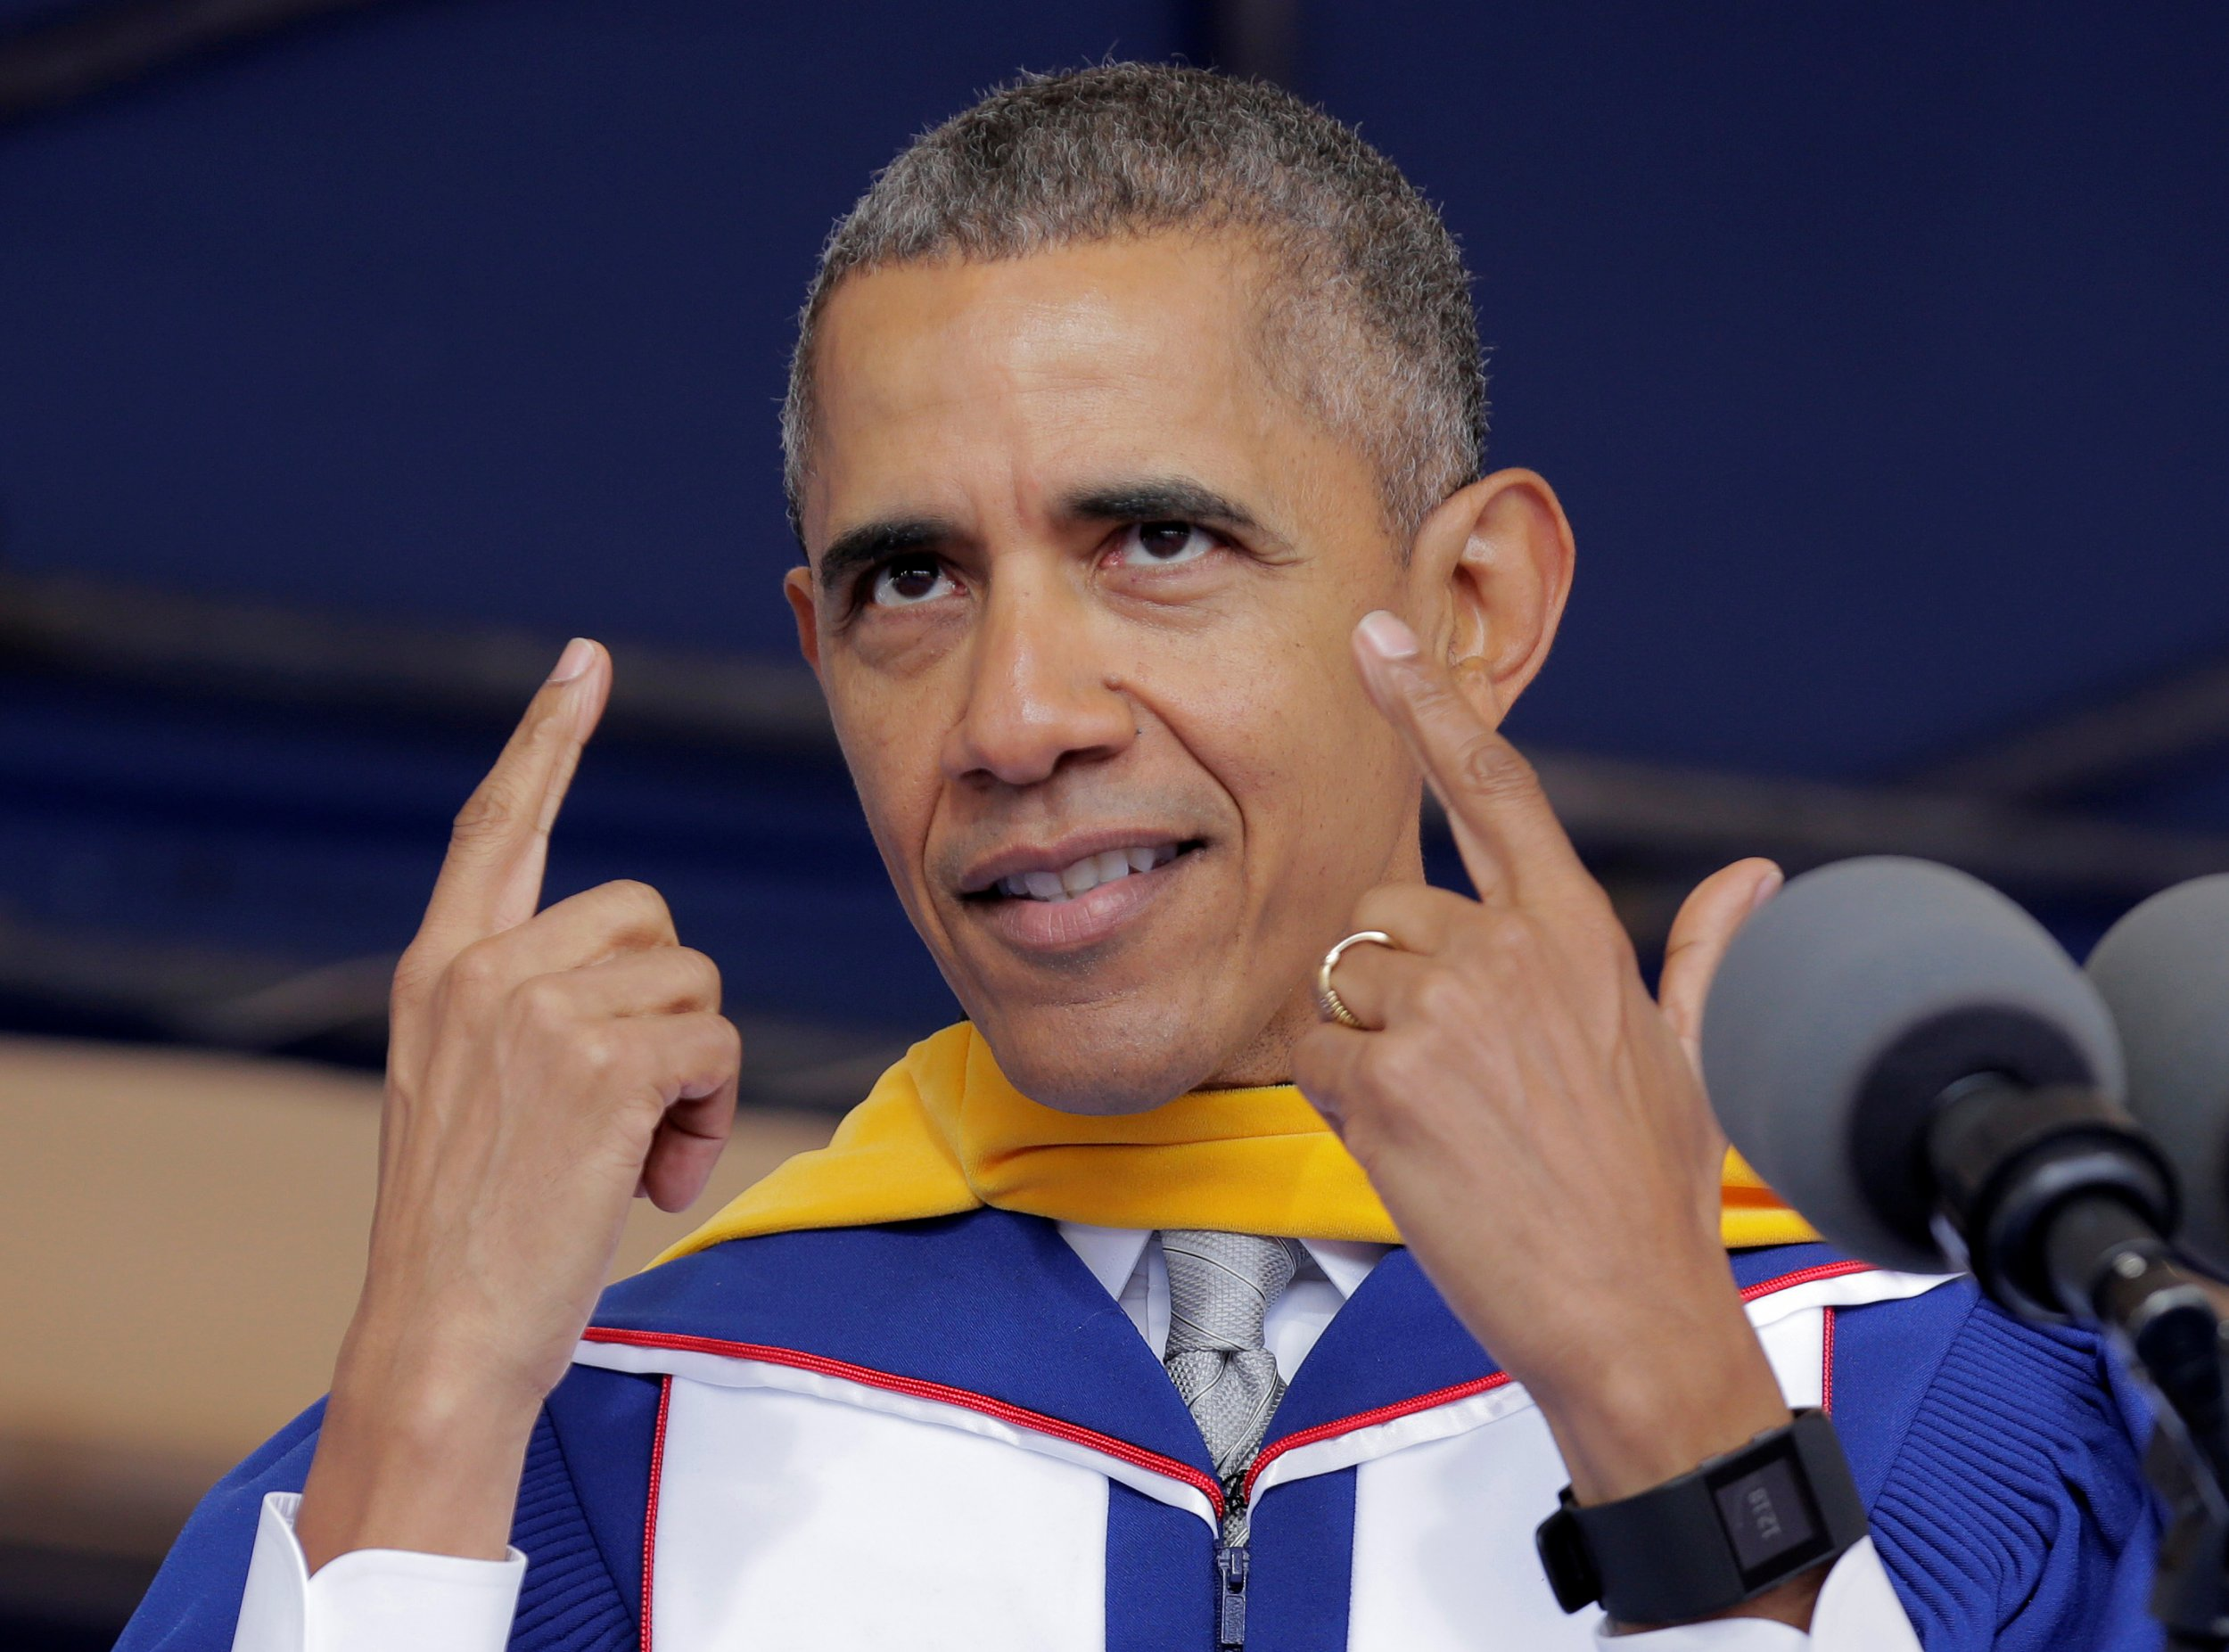 obama change has come speech pdf